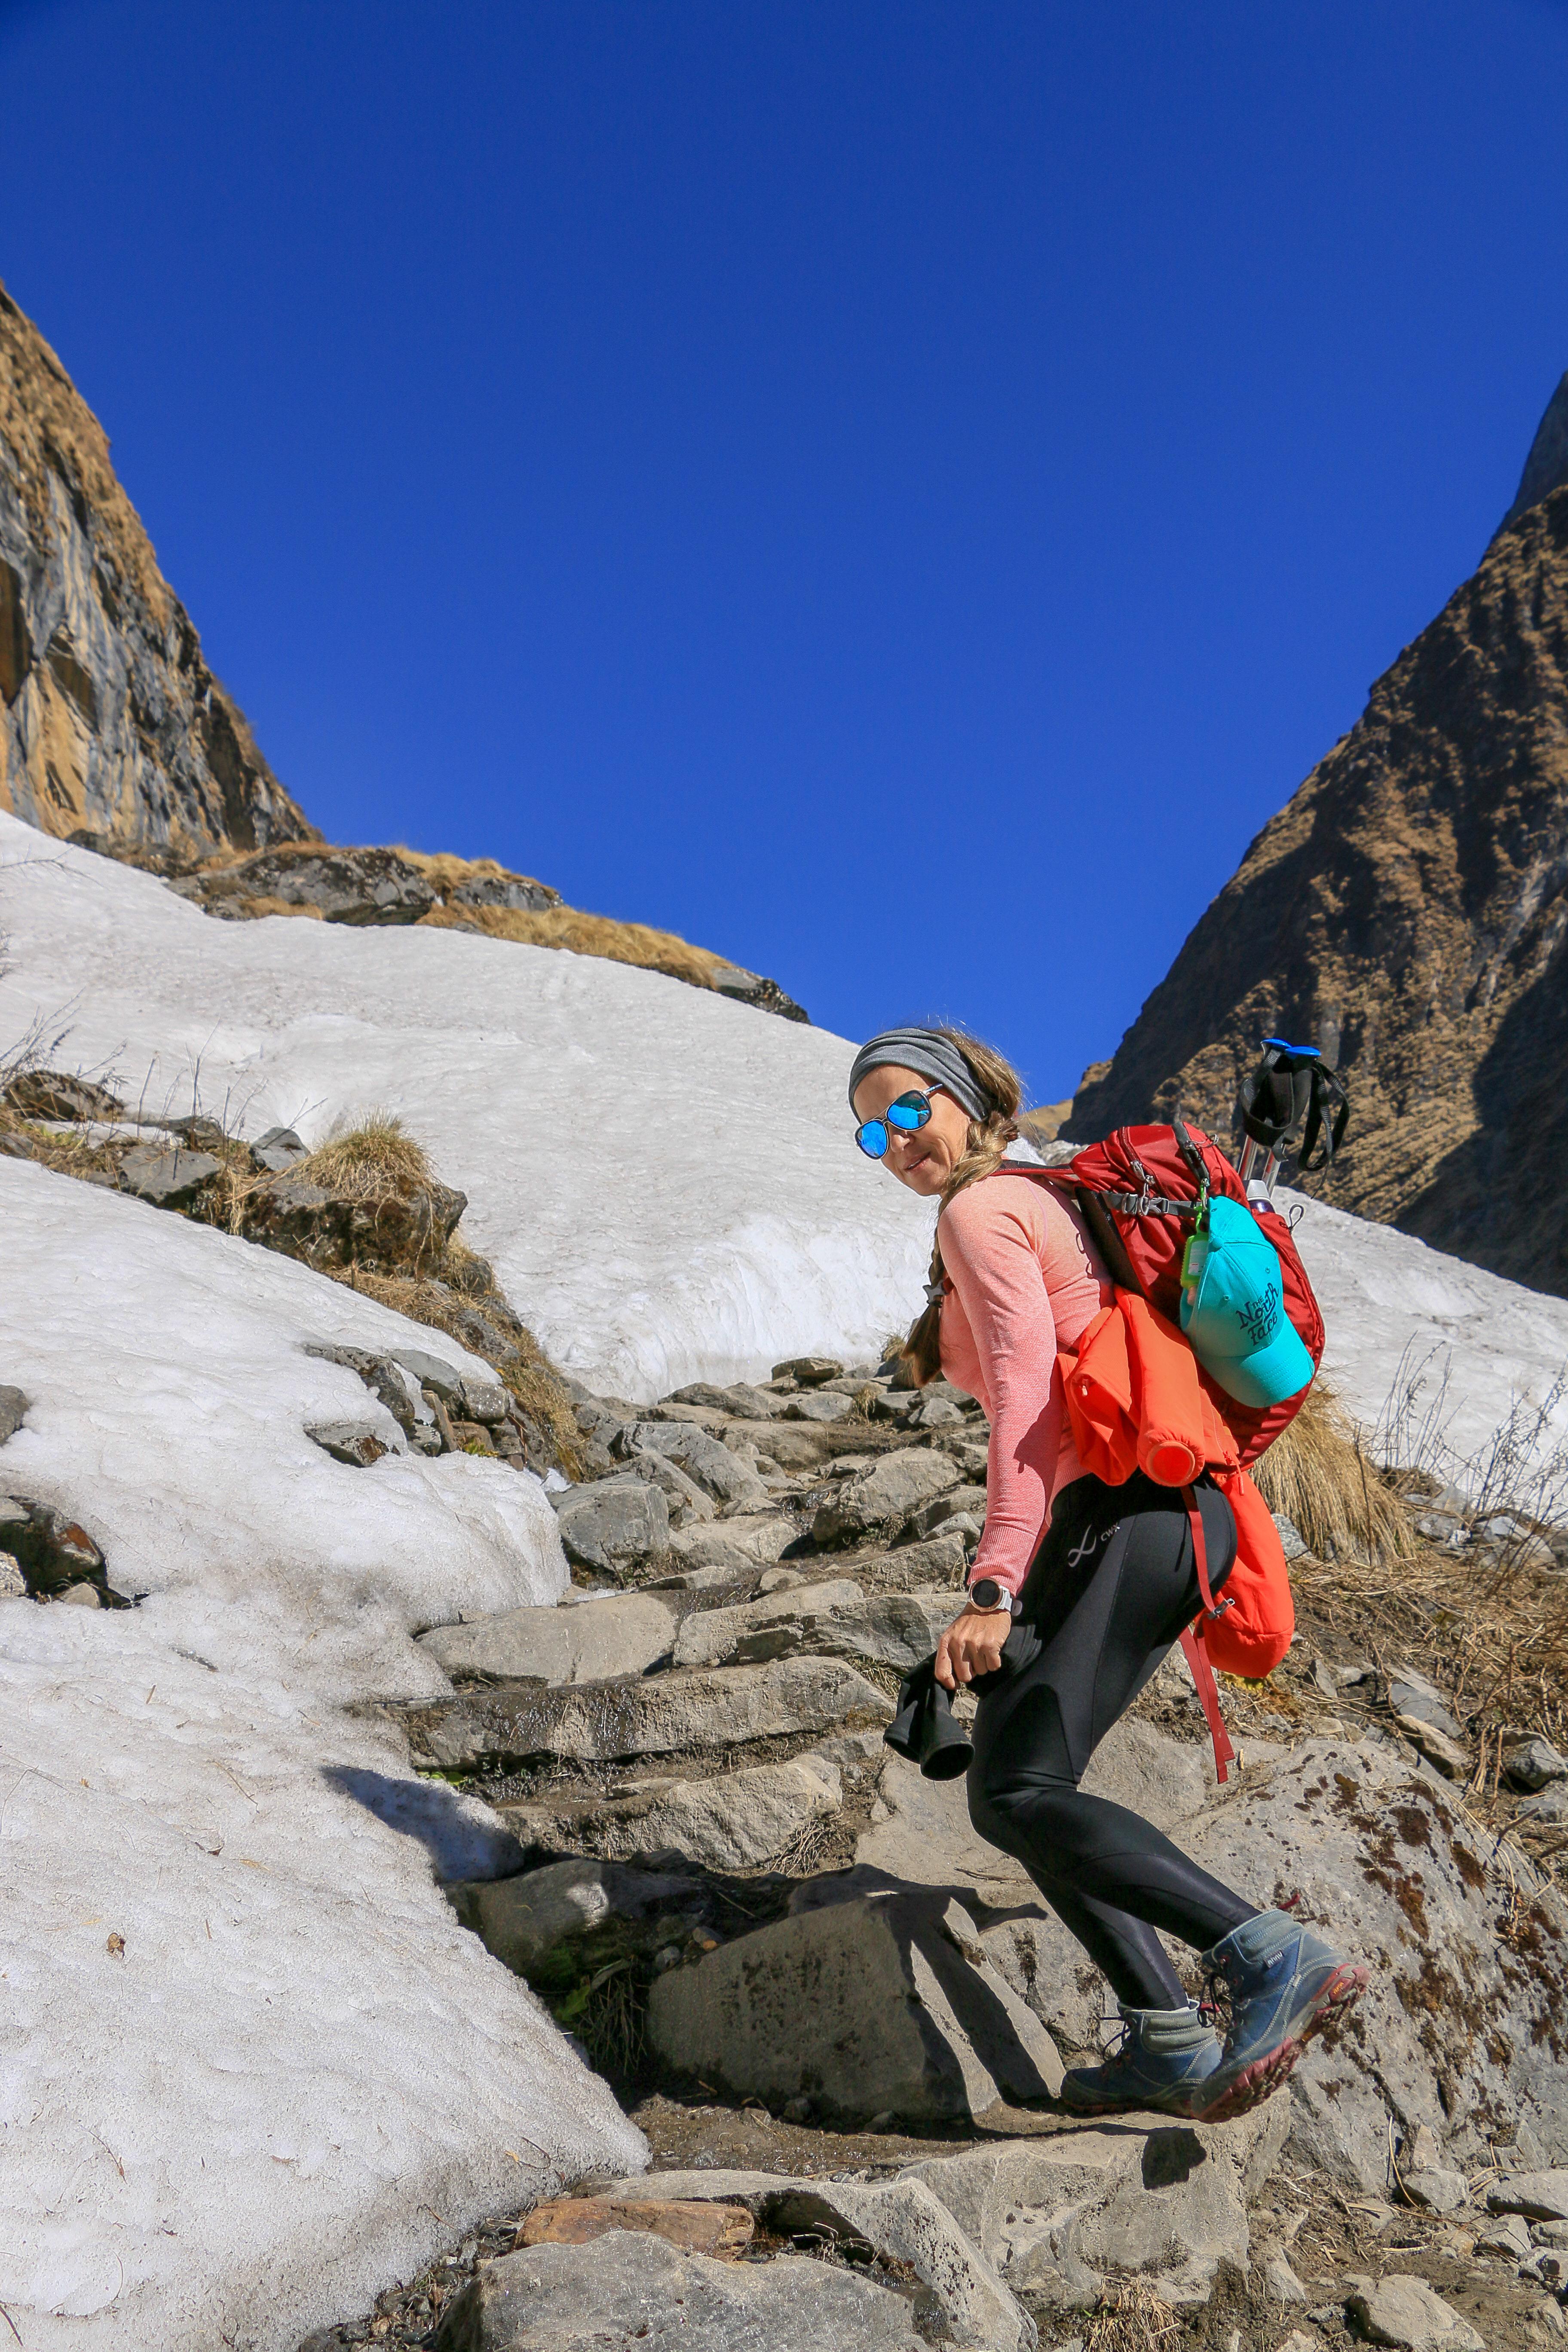 Paula climbing mountain snow